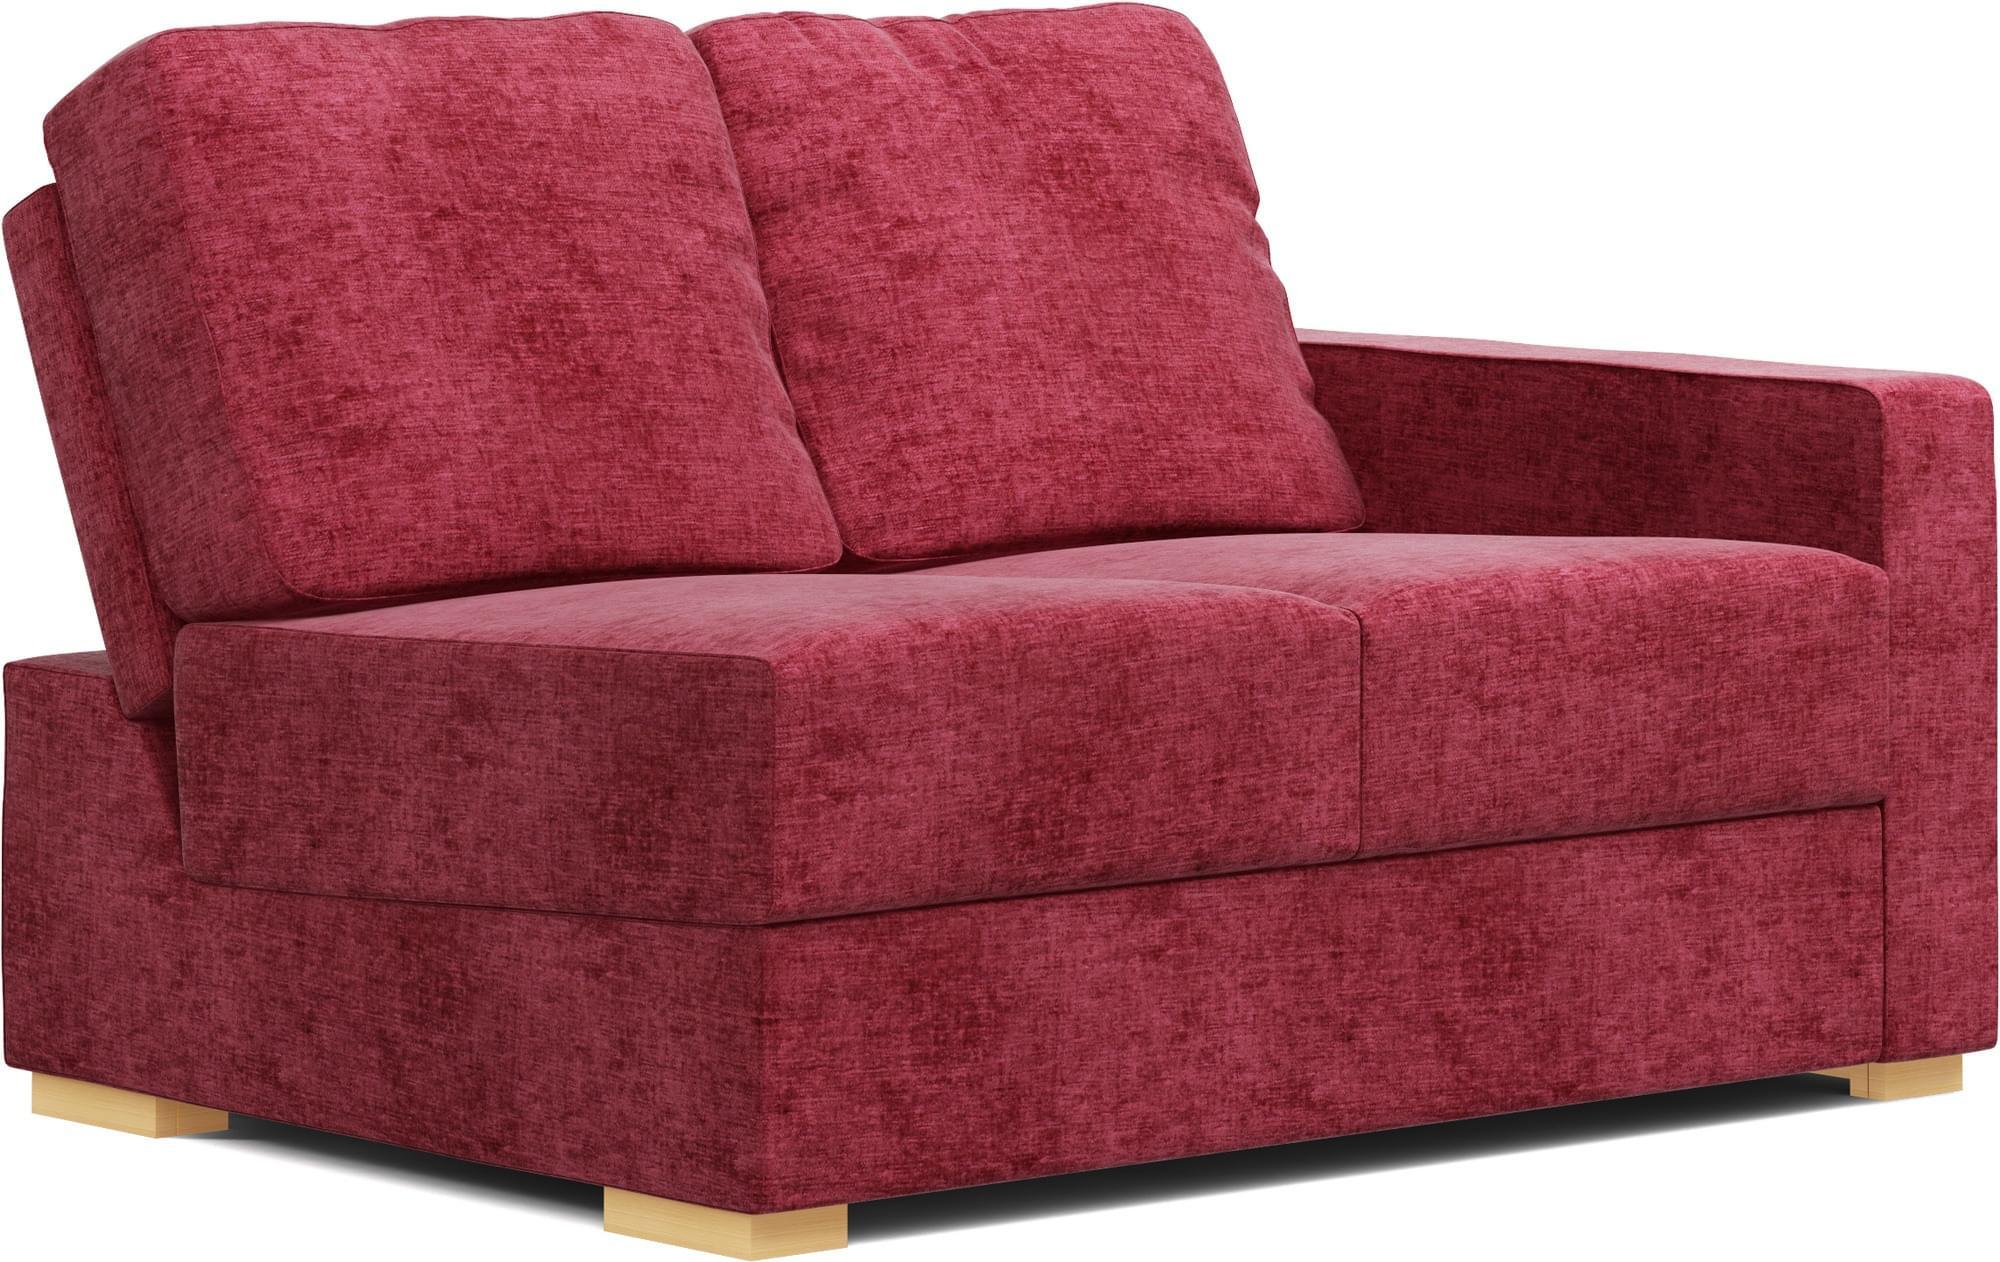 lear one armless 2 seat space saving sofa